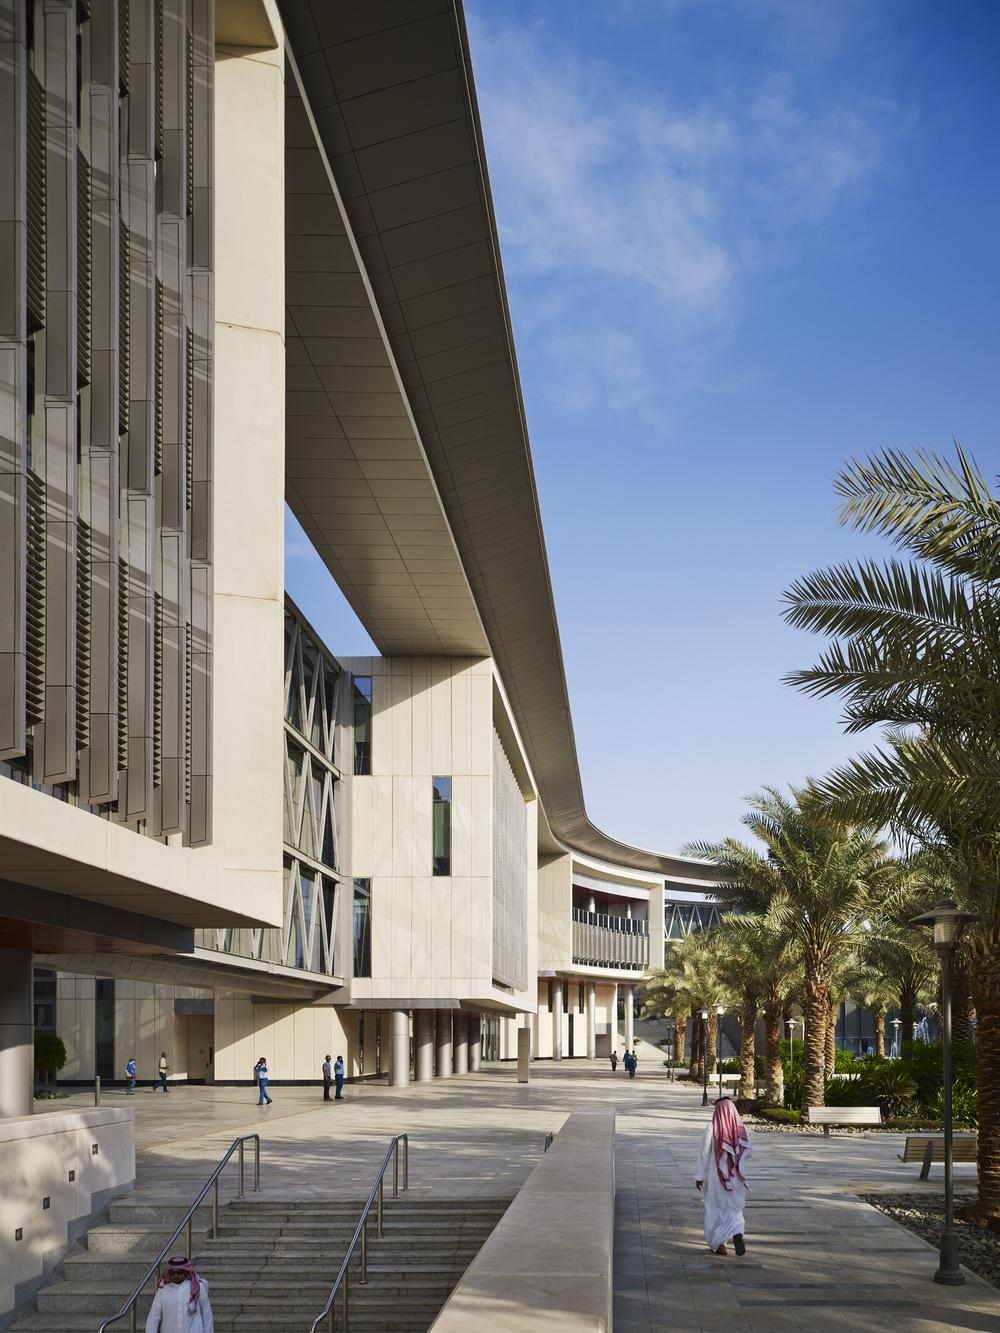 KSAU Jeddah Campus  Perkins+Will with Dar Al Handasah (Shair and Partners)  Jeddah, Saudi Arabia     Return to Projects